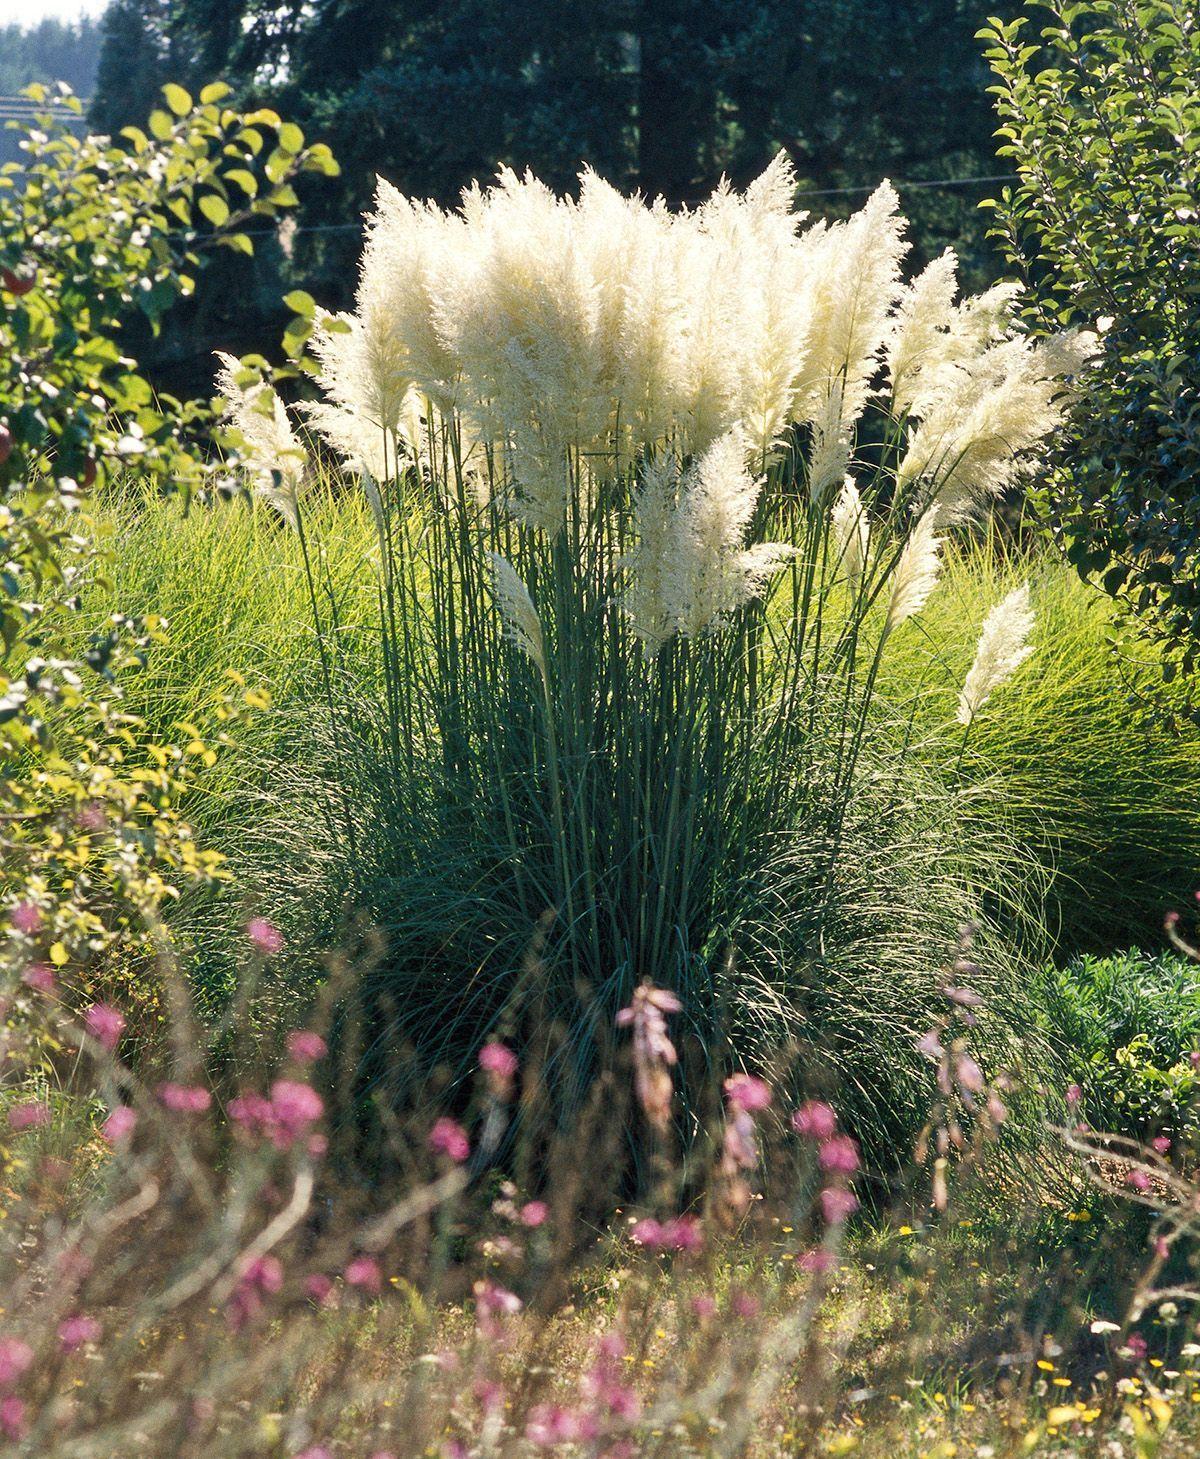 23 Varieties Of Ornamental Grasses We Re Obsessed With Dwarf Pampas Grass Grow 23 Varieti Ornamental Grasses Tall Grass Landscaping Grasses Landscaping